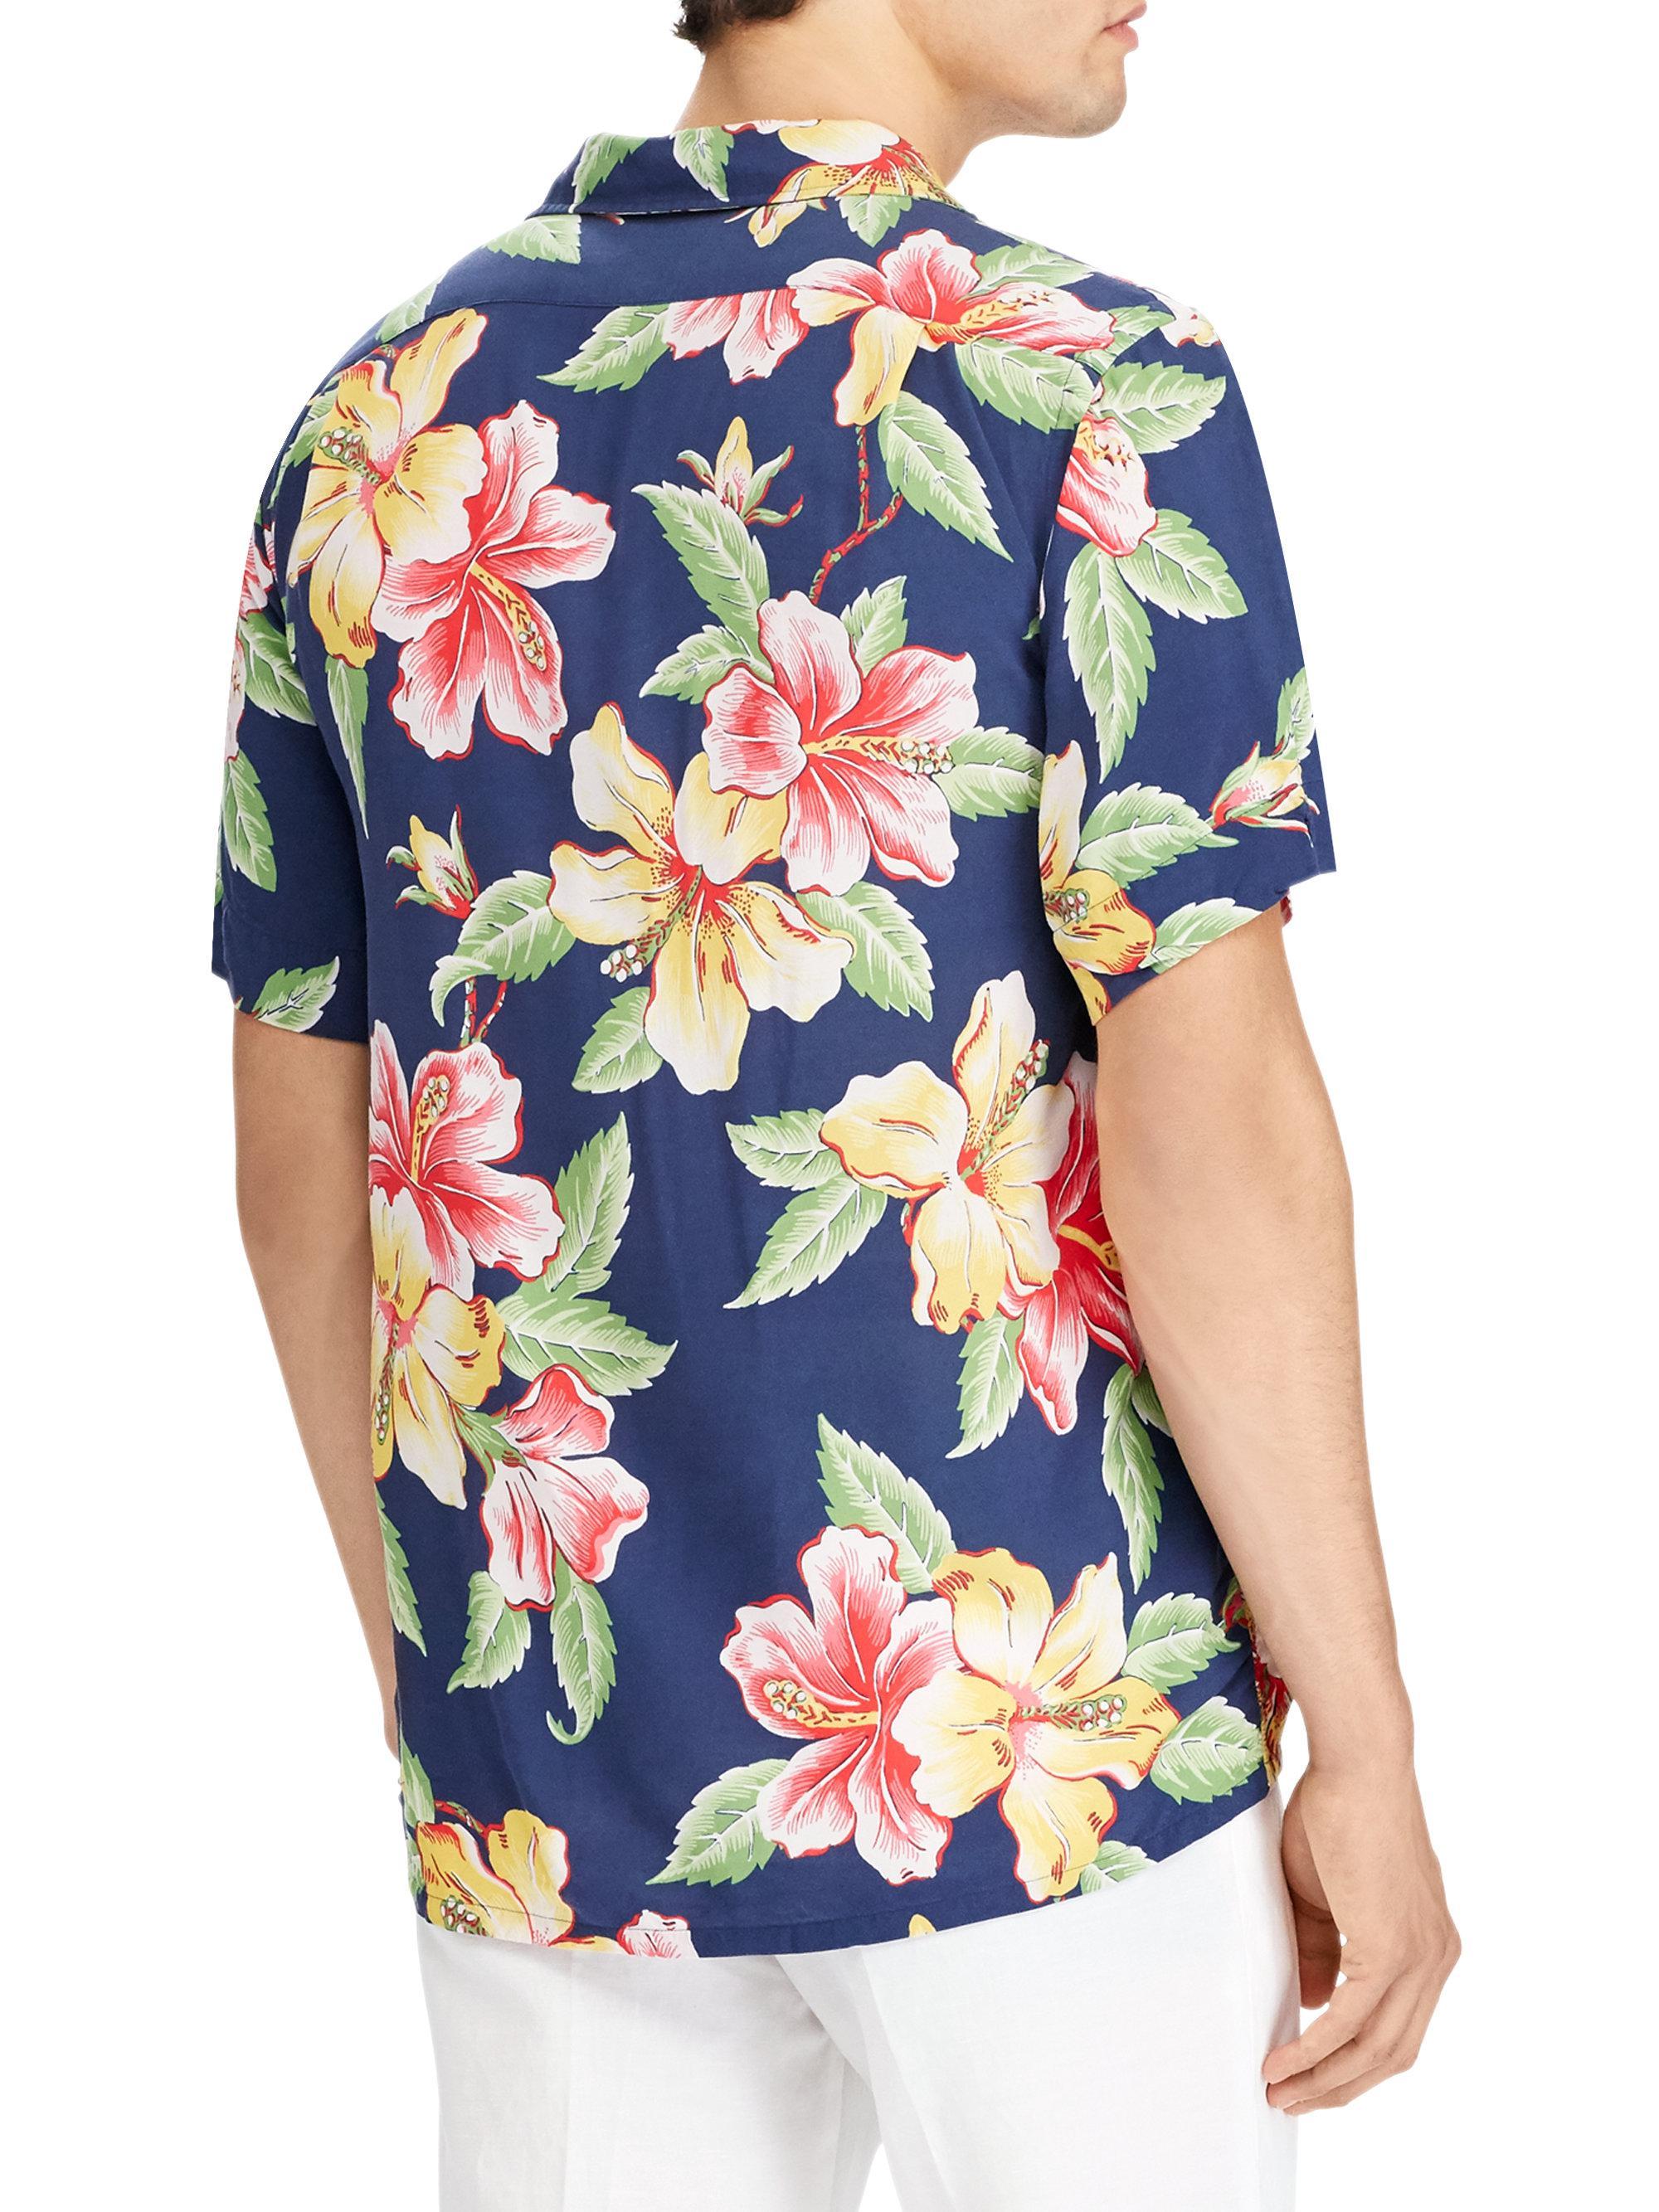 Lyst polo ralph lauren floral print button down shirt in for Floral print button up shirt